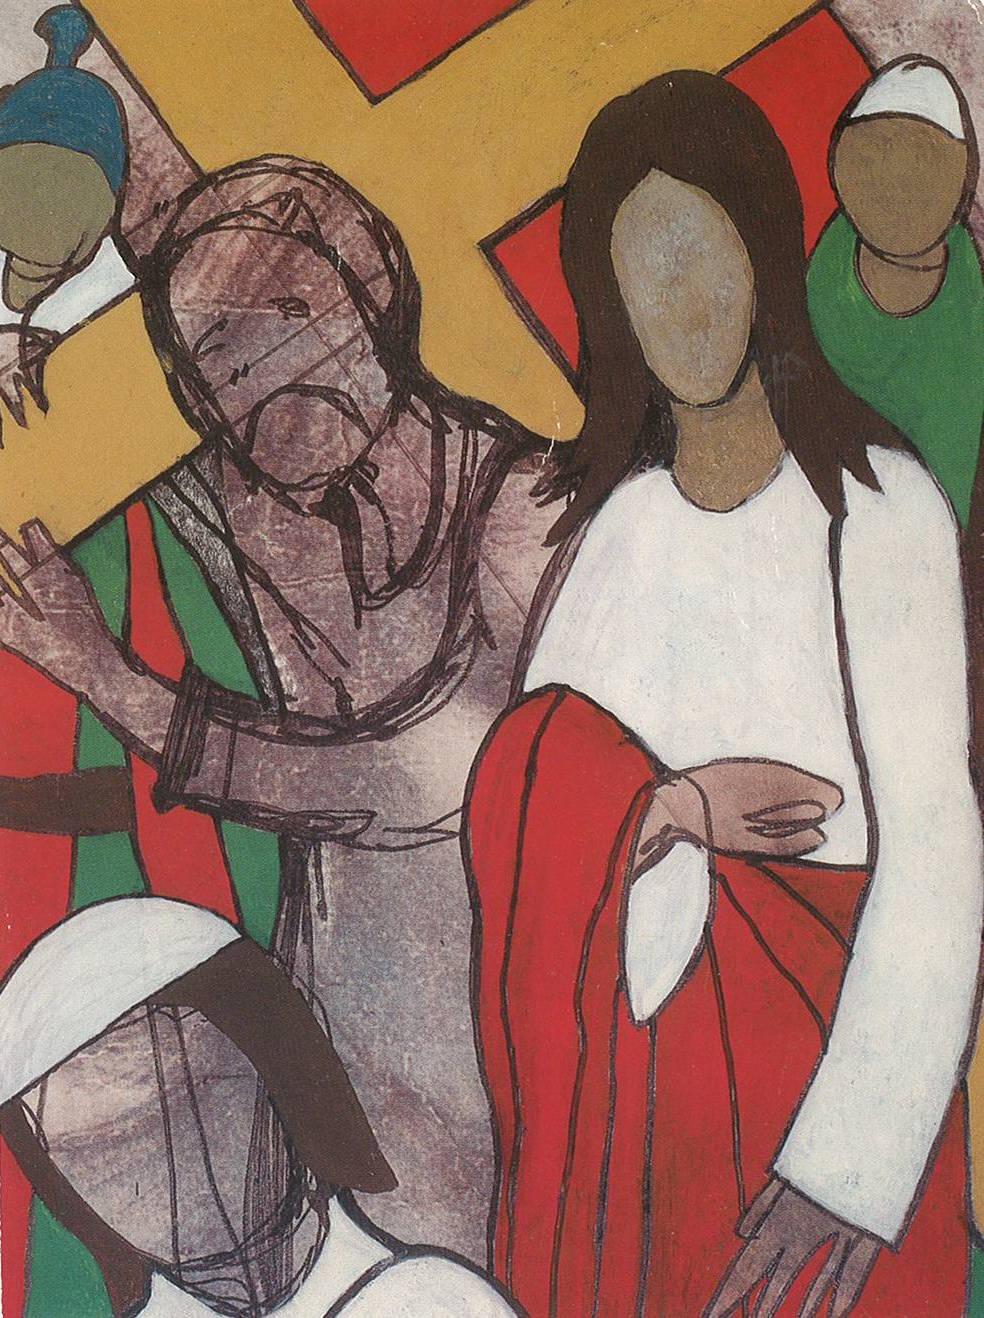 Sedam postaja križnog puta - Peta postaja - Šimun Cirenac pomaže Isusu nositi križ (kombinirana tehnika, 24.5 cm - 20 cm, 10.6.1989.)